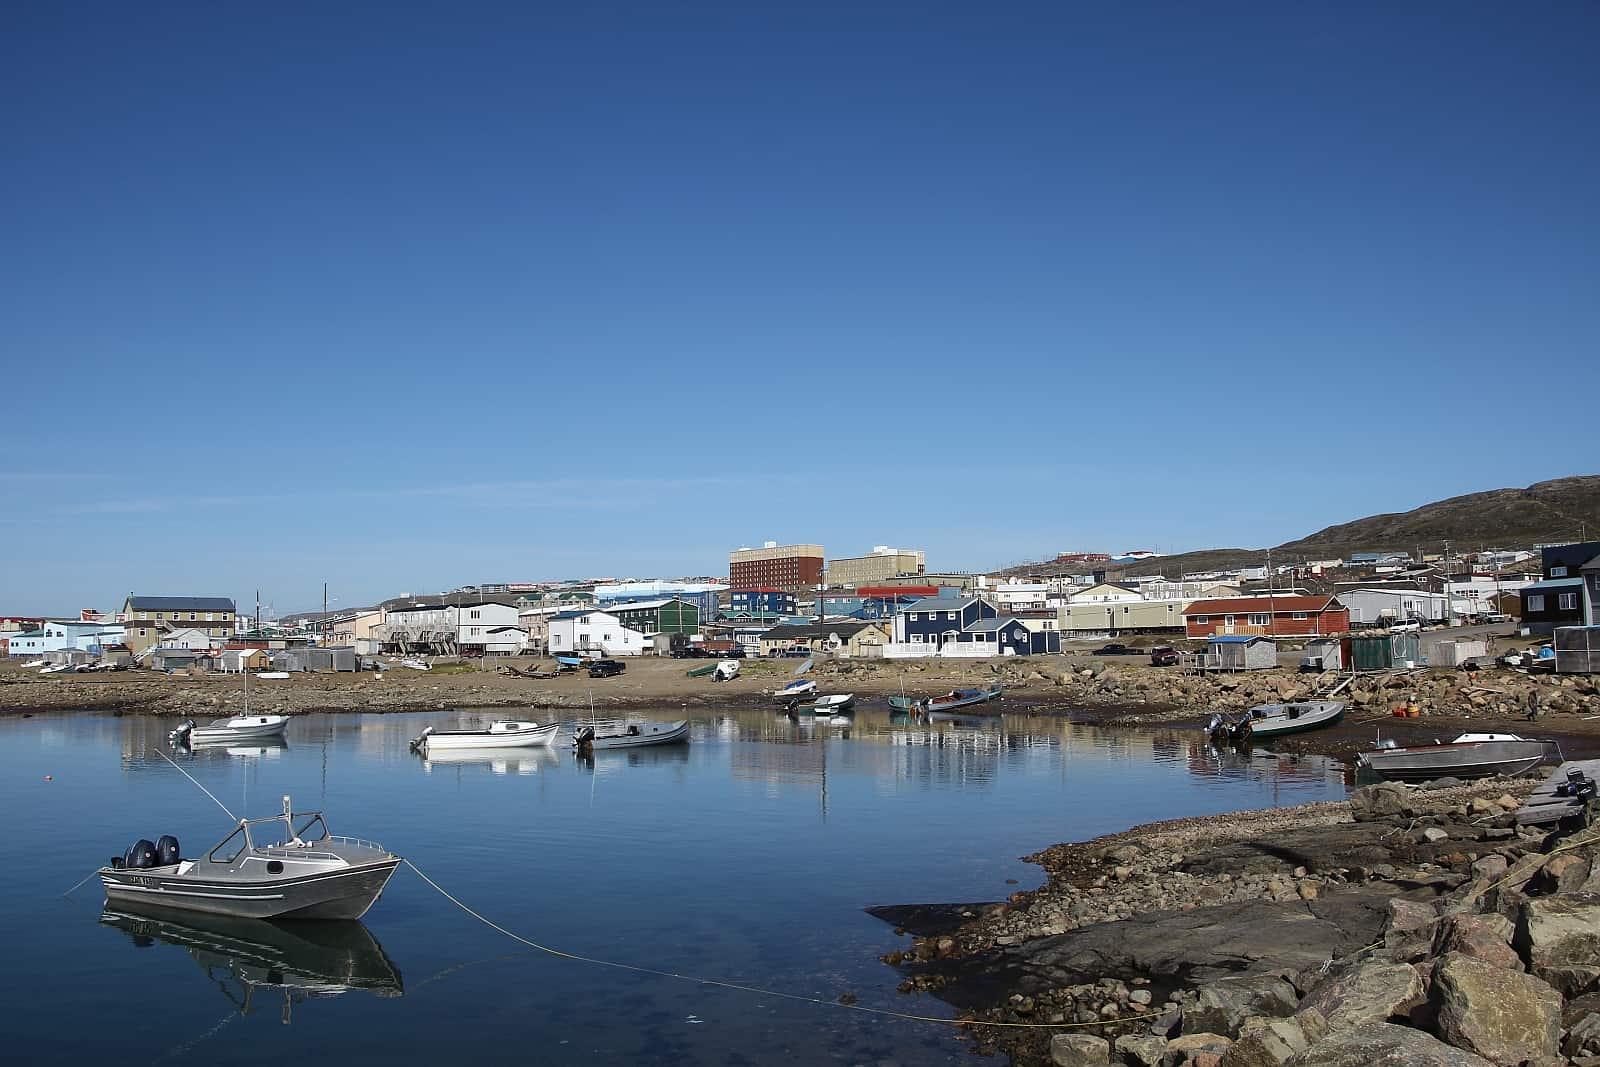 Blick auf Iqaluit, die Hauptstadt Nunavuts. Foto Sebastian Kasten/https://creativecommons.org/licenses/by-sa/3.0/deed.en